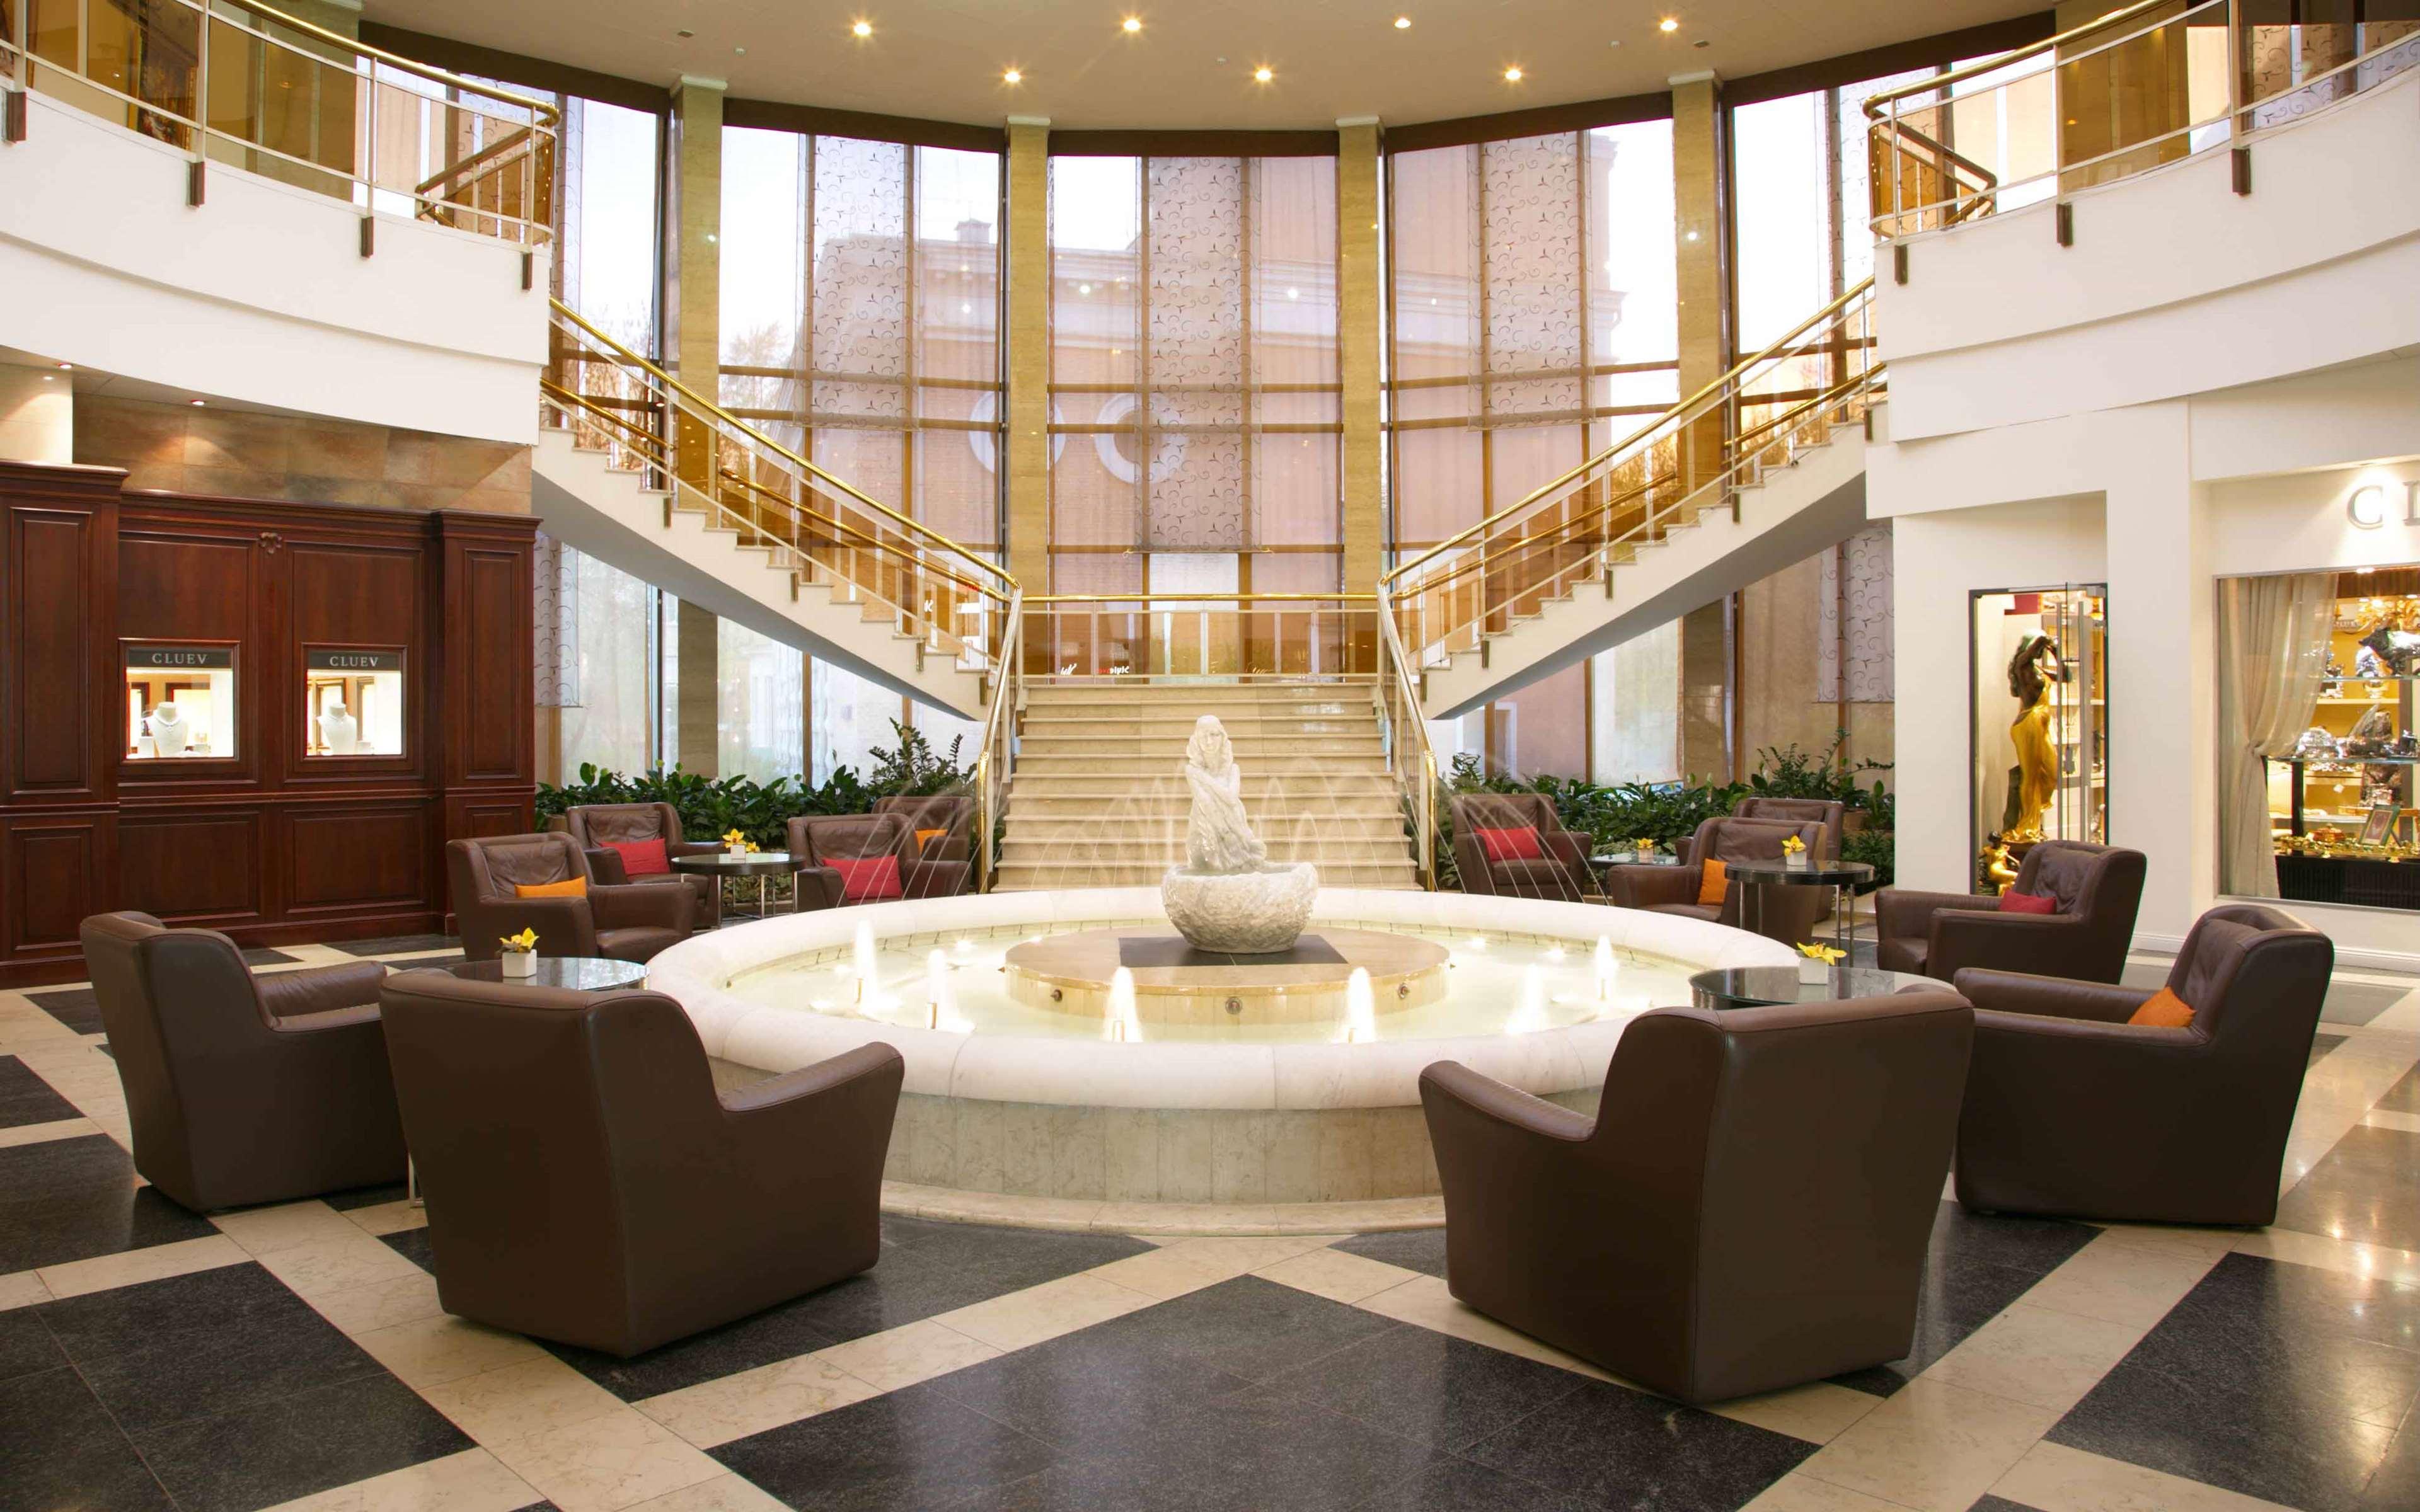 Radisson Slavyanskaya Hotel & Business Center, Moscow